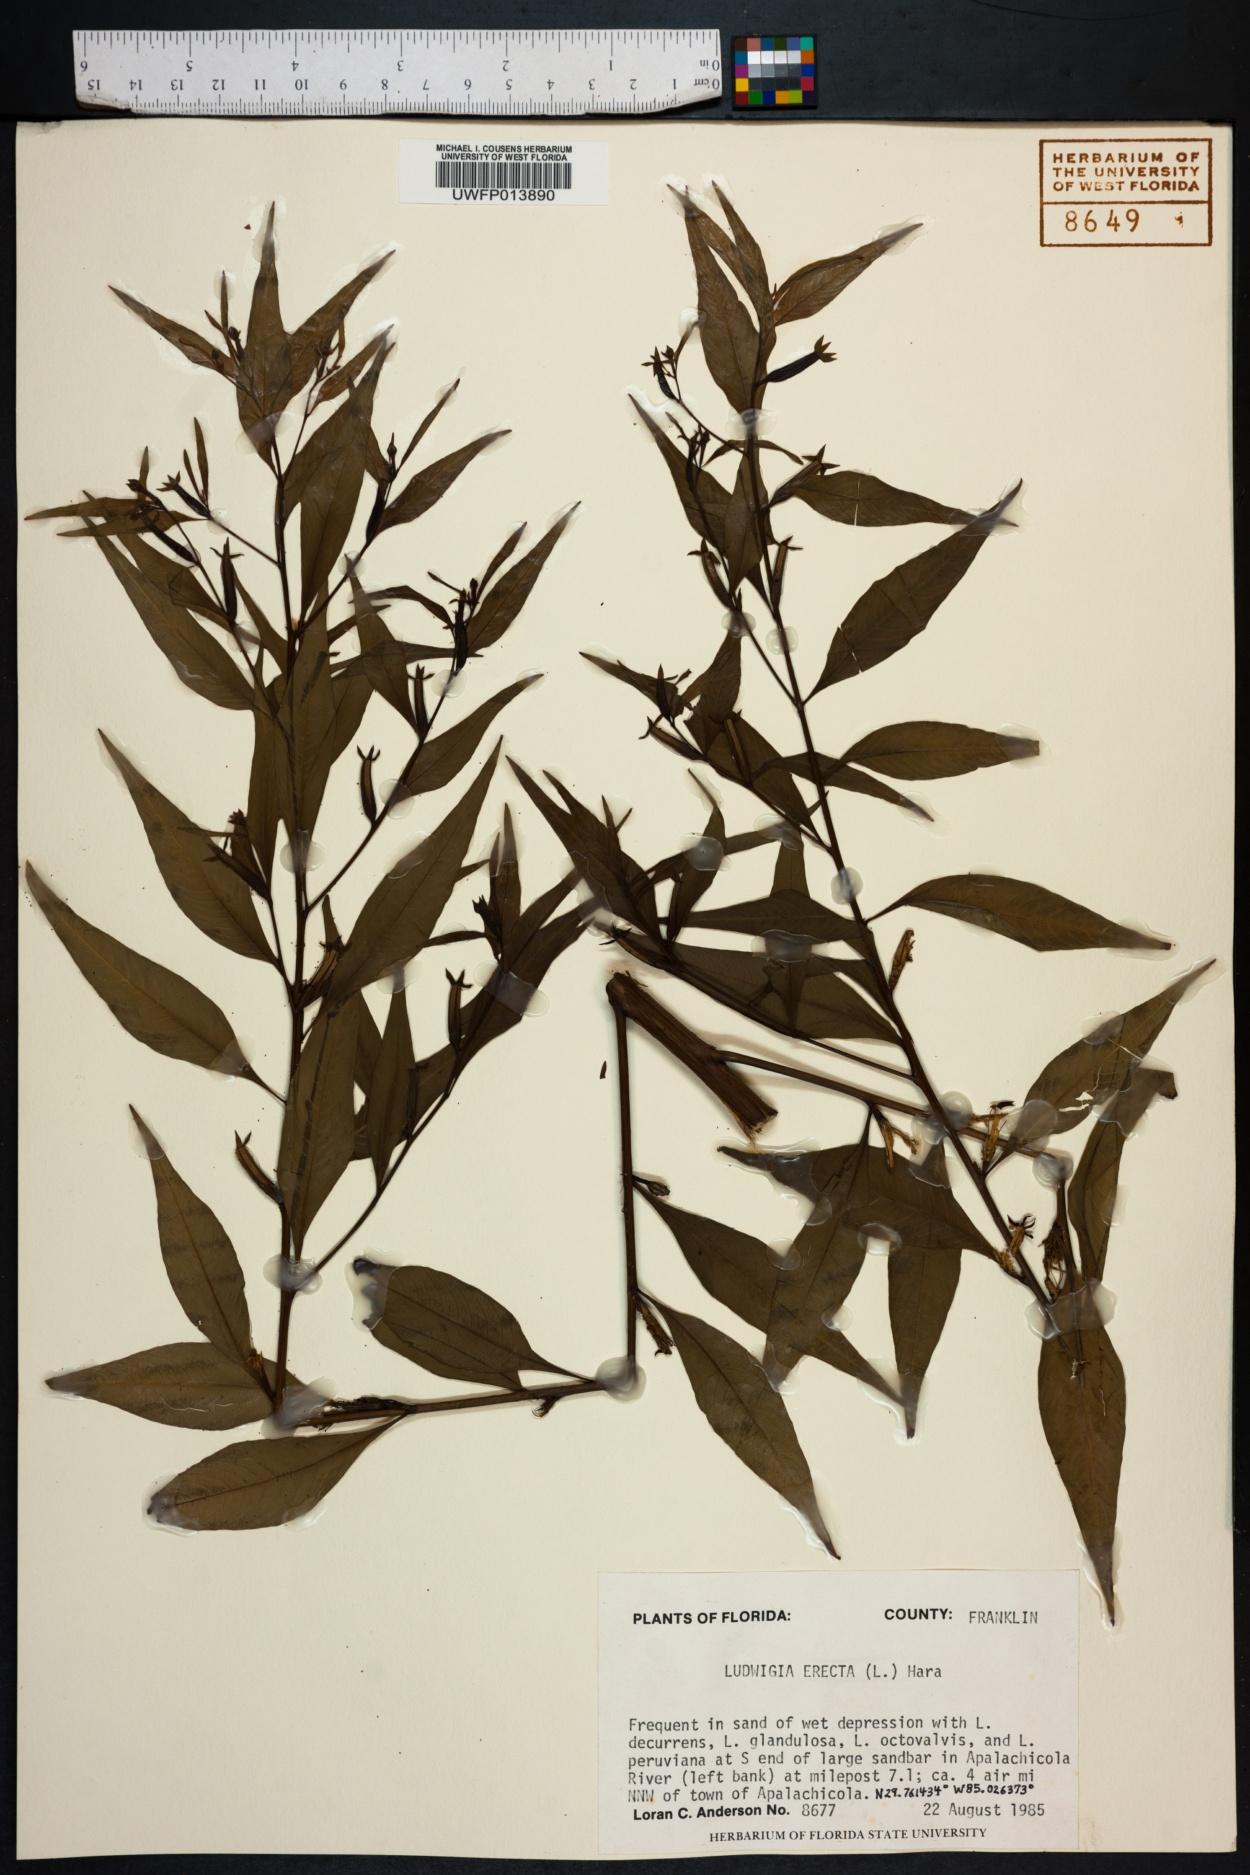 Ludwigia erecta image